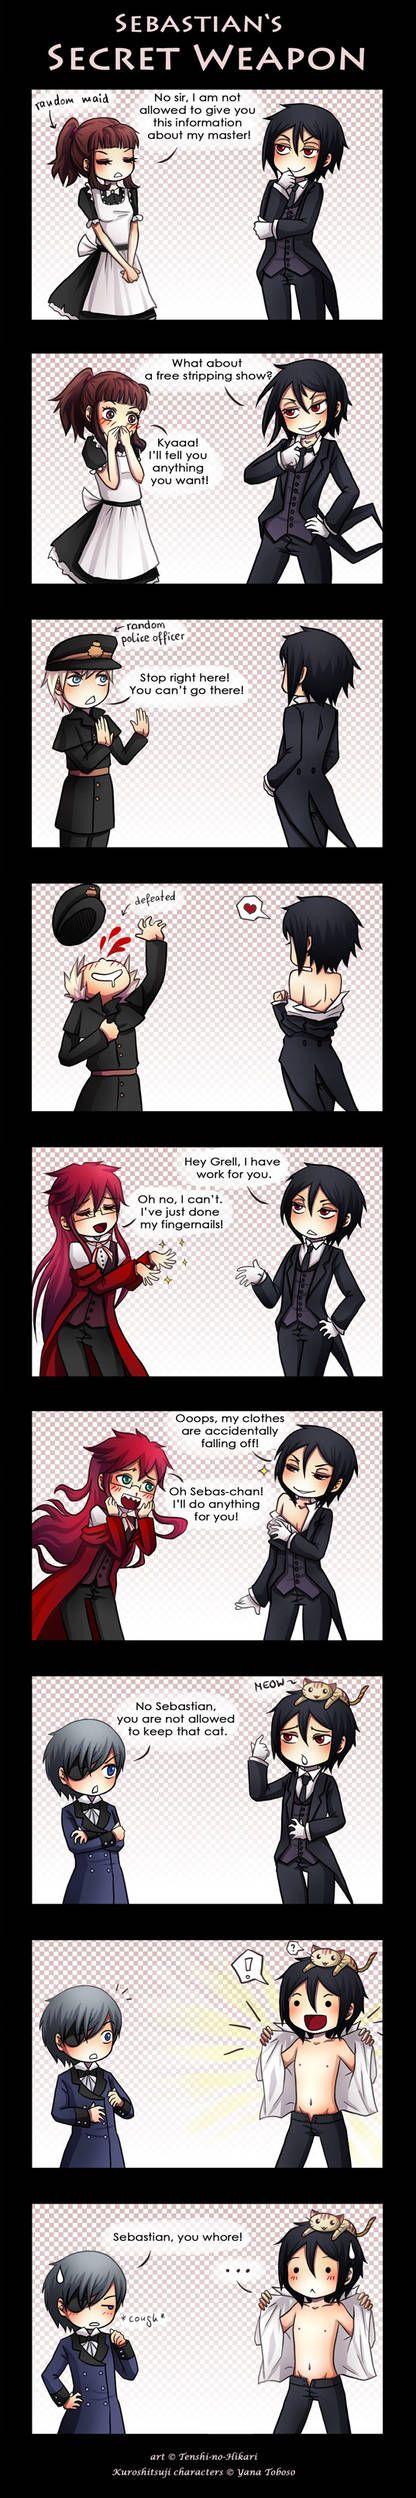 O.o Thats one weapon........